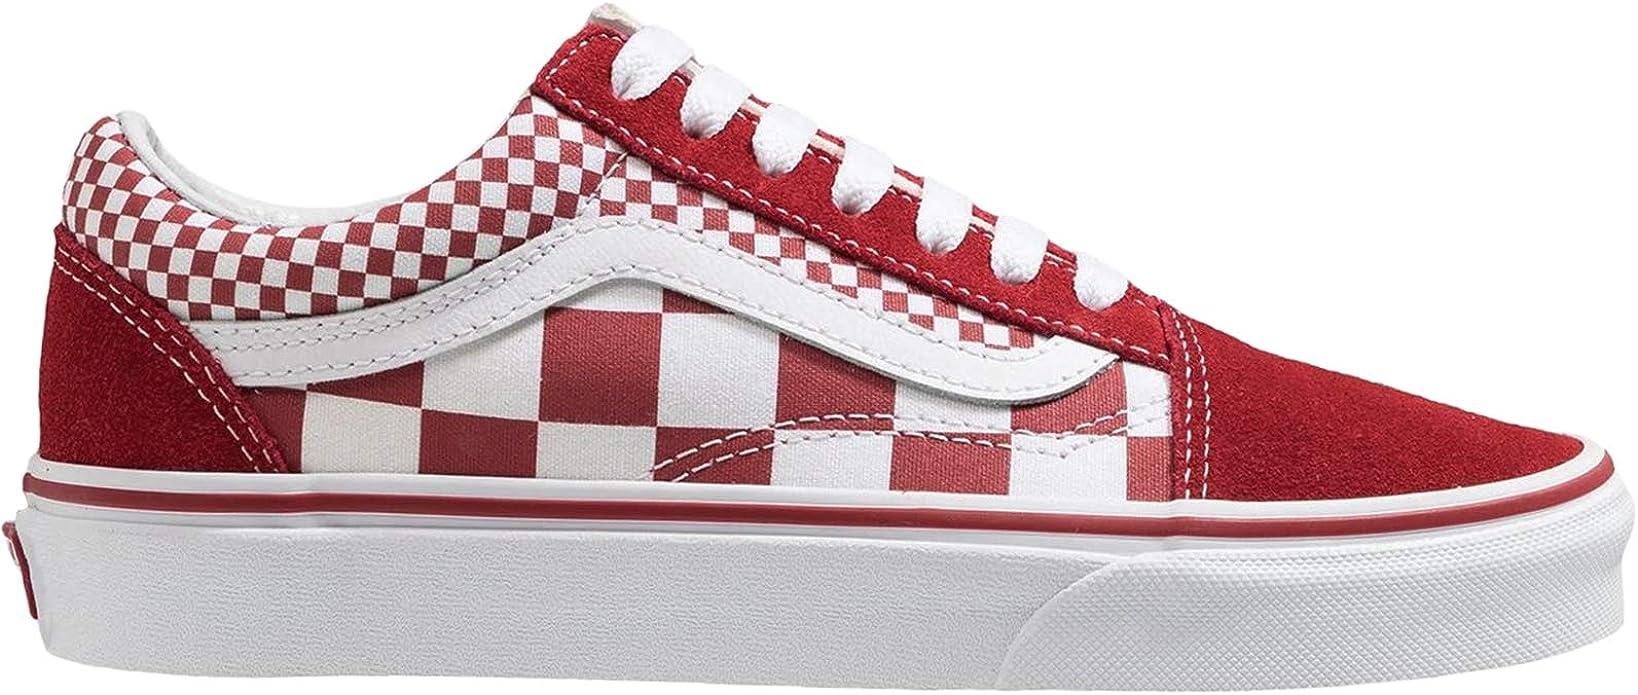 Vans Old Skool Sneakers Damen Herren Unisex Rot Weiß Kariert